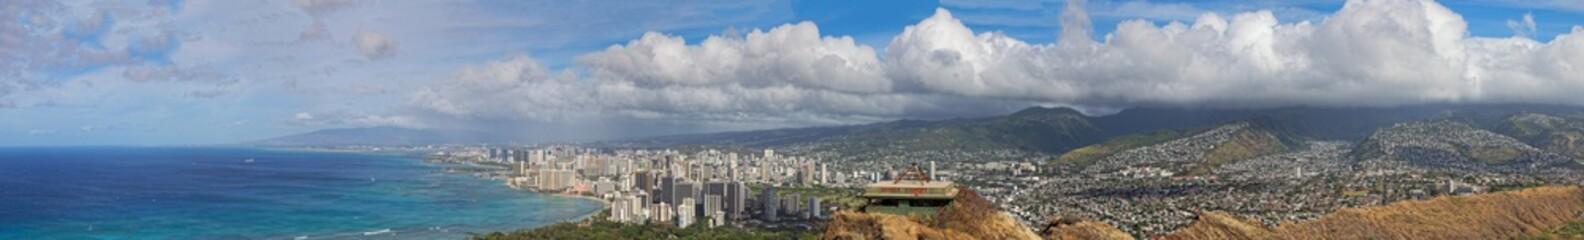 Panoramamic view of downtown Honolulu and Waikiki, Oahu, Hawaii